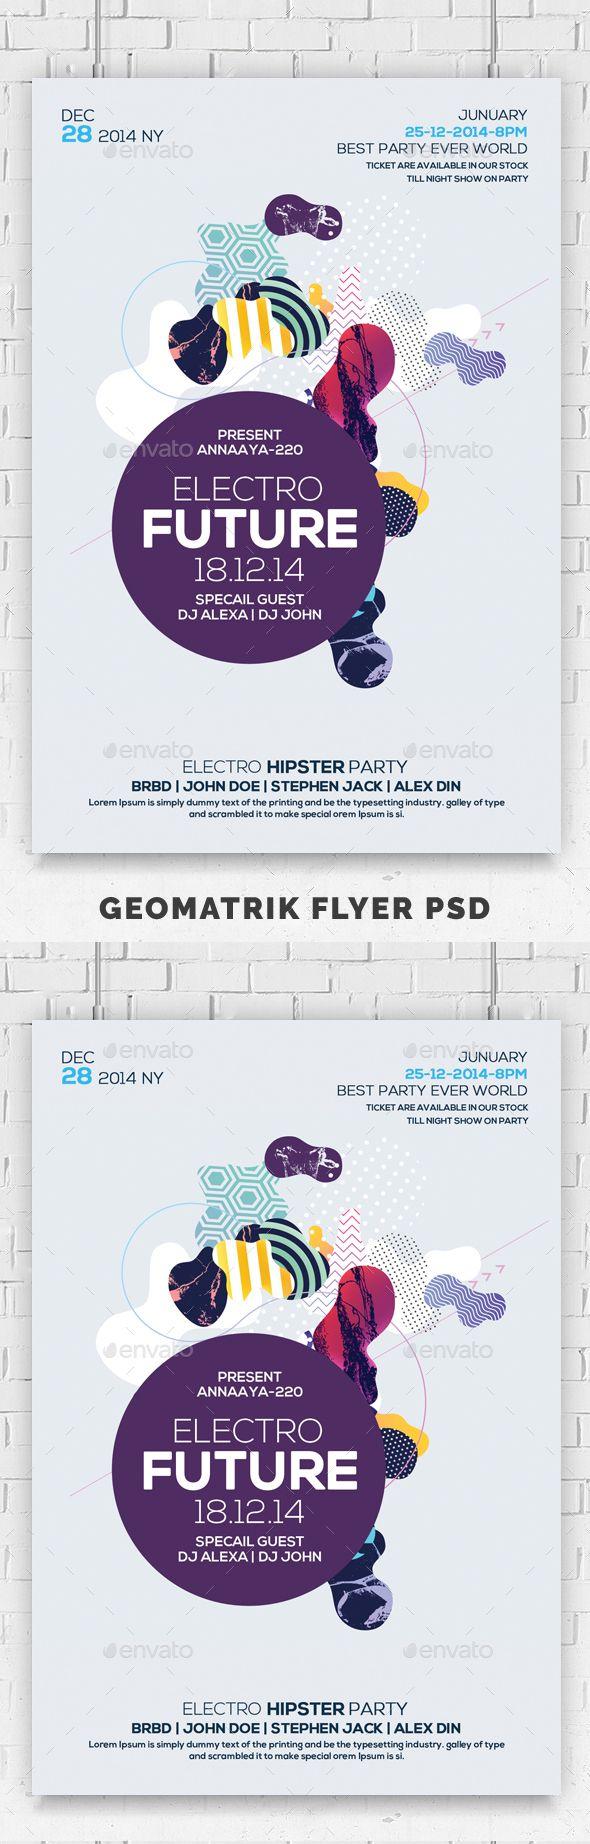 Electro Future Flyer Psd — Photoshop PSD electro future modern ...